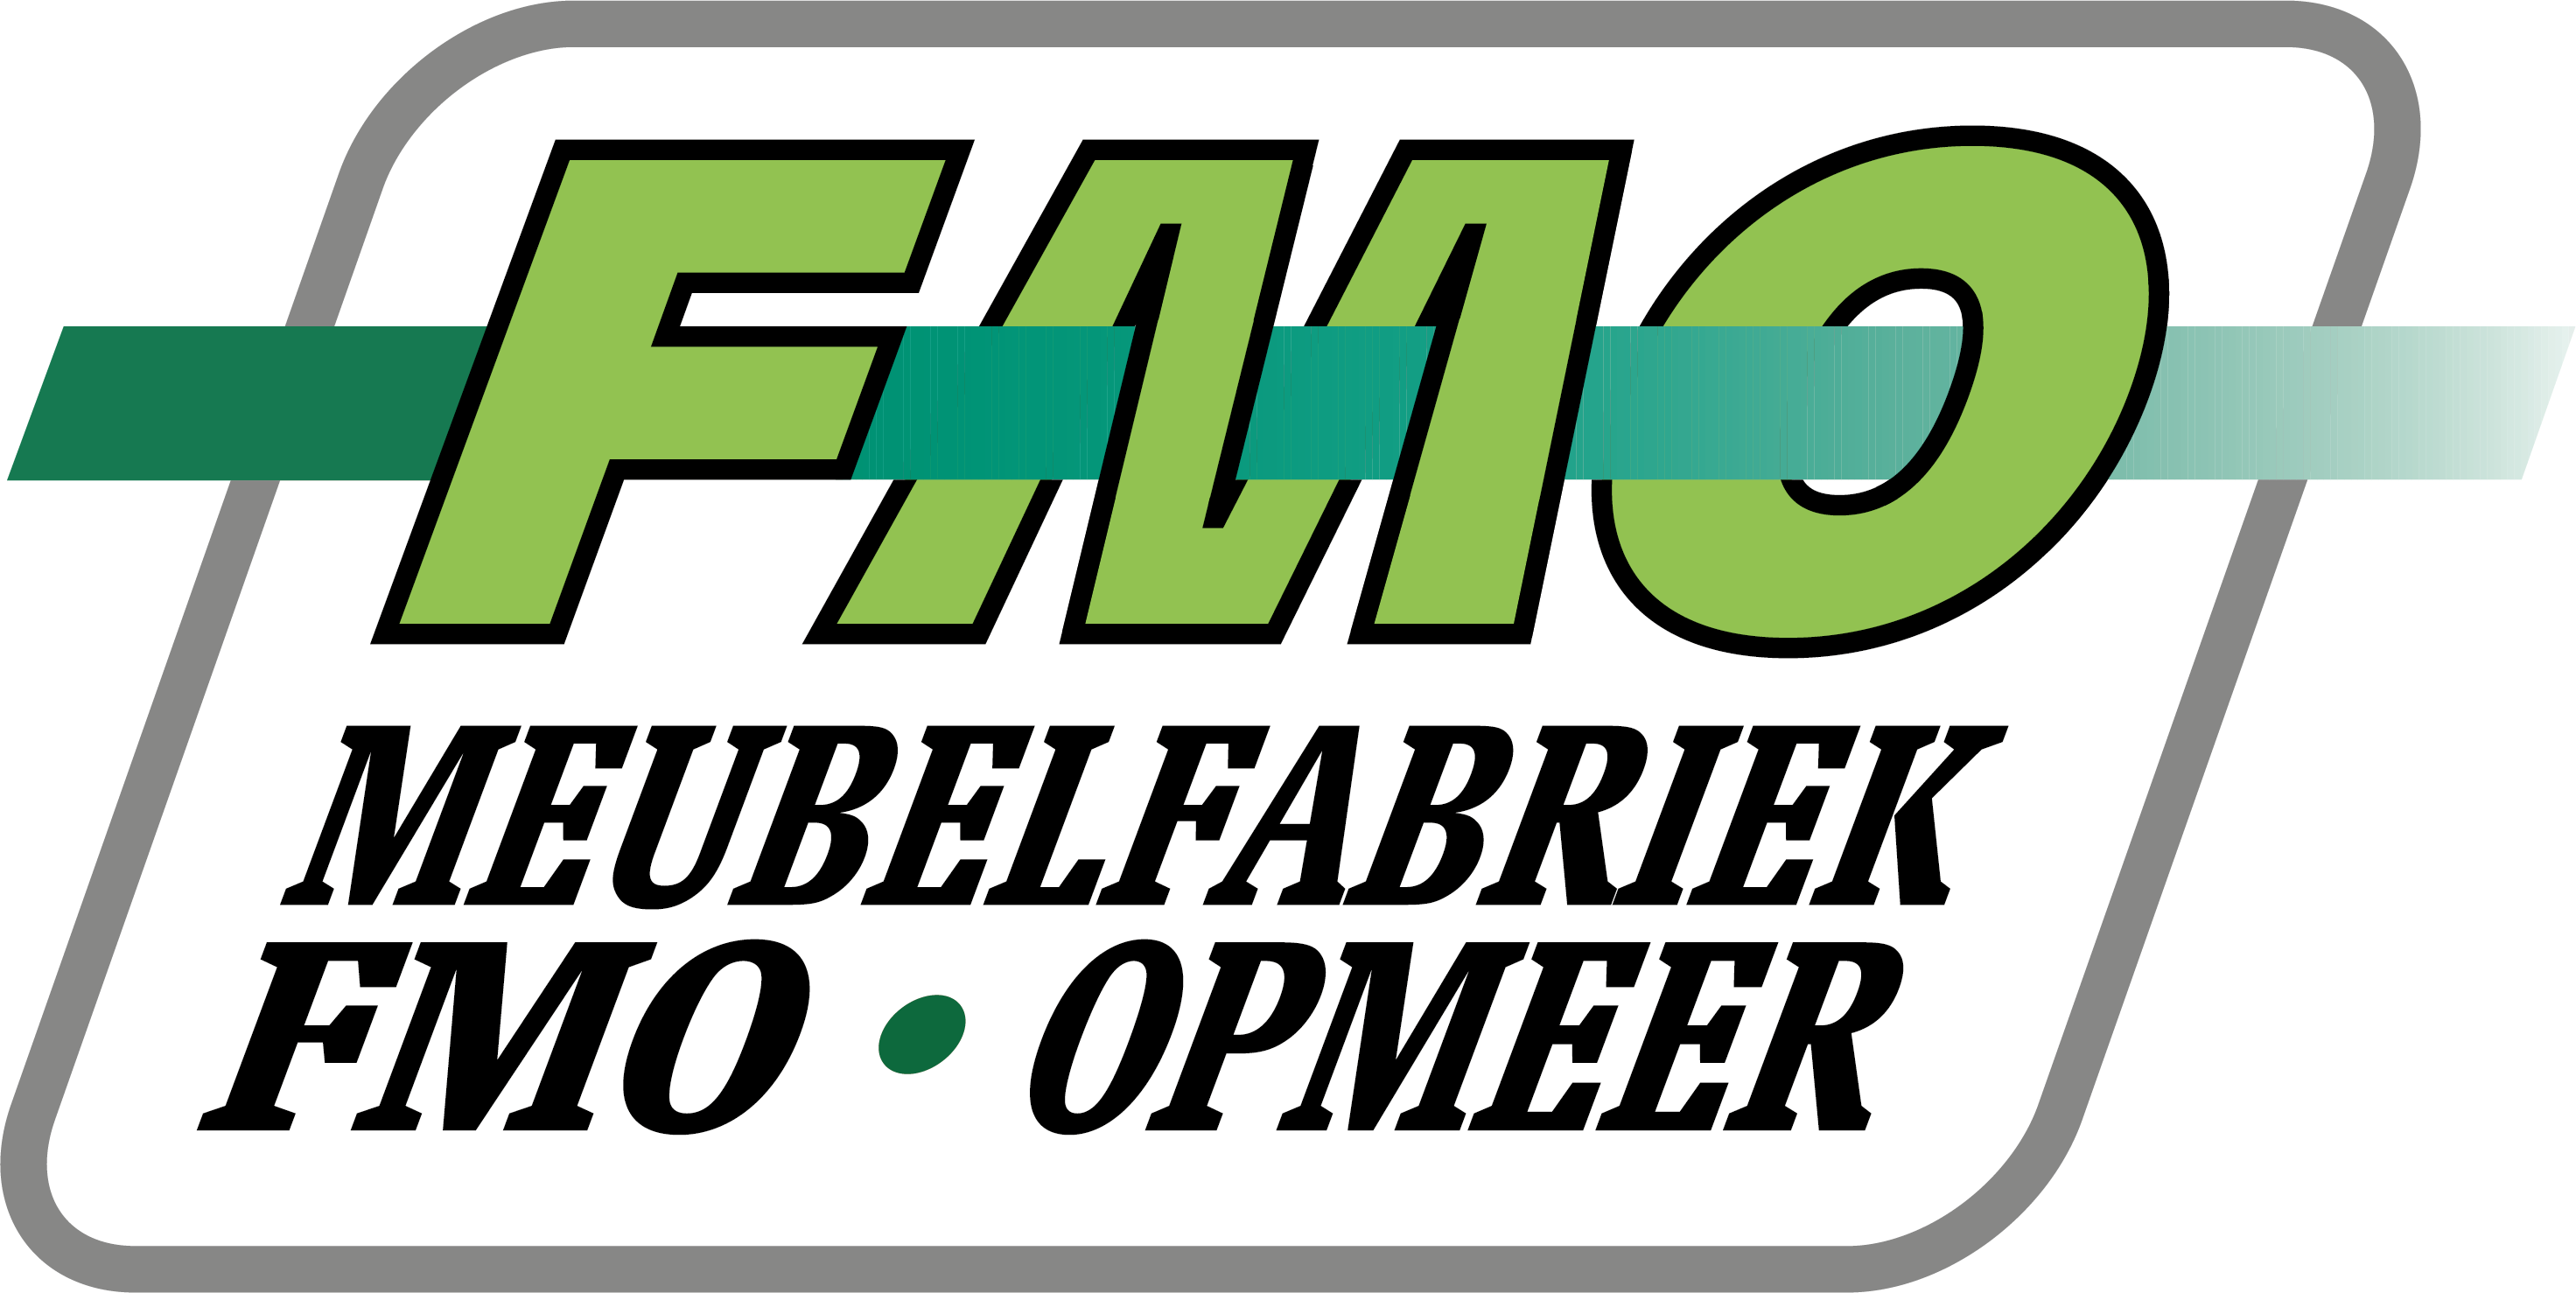 Meubelfabriek FMO